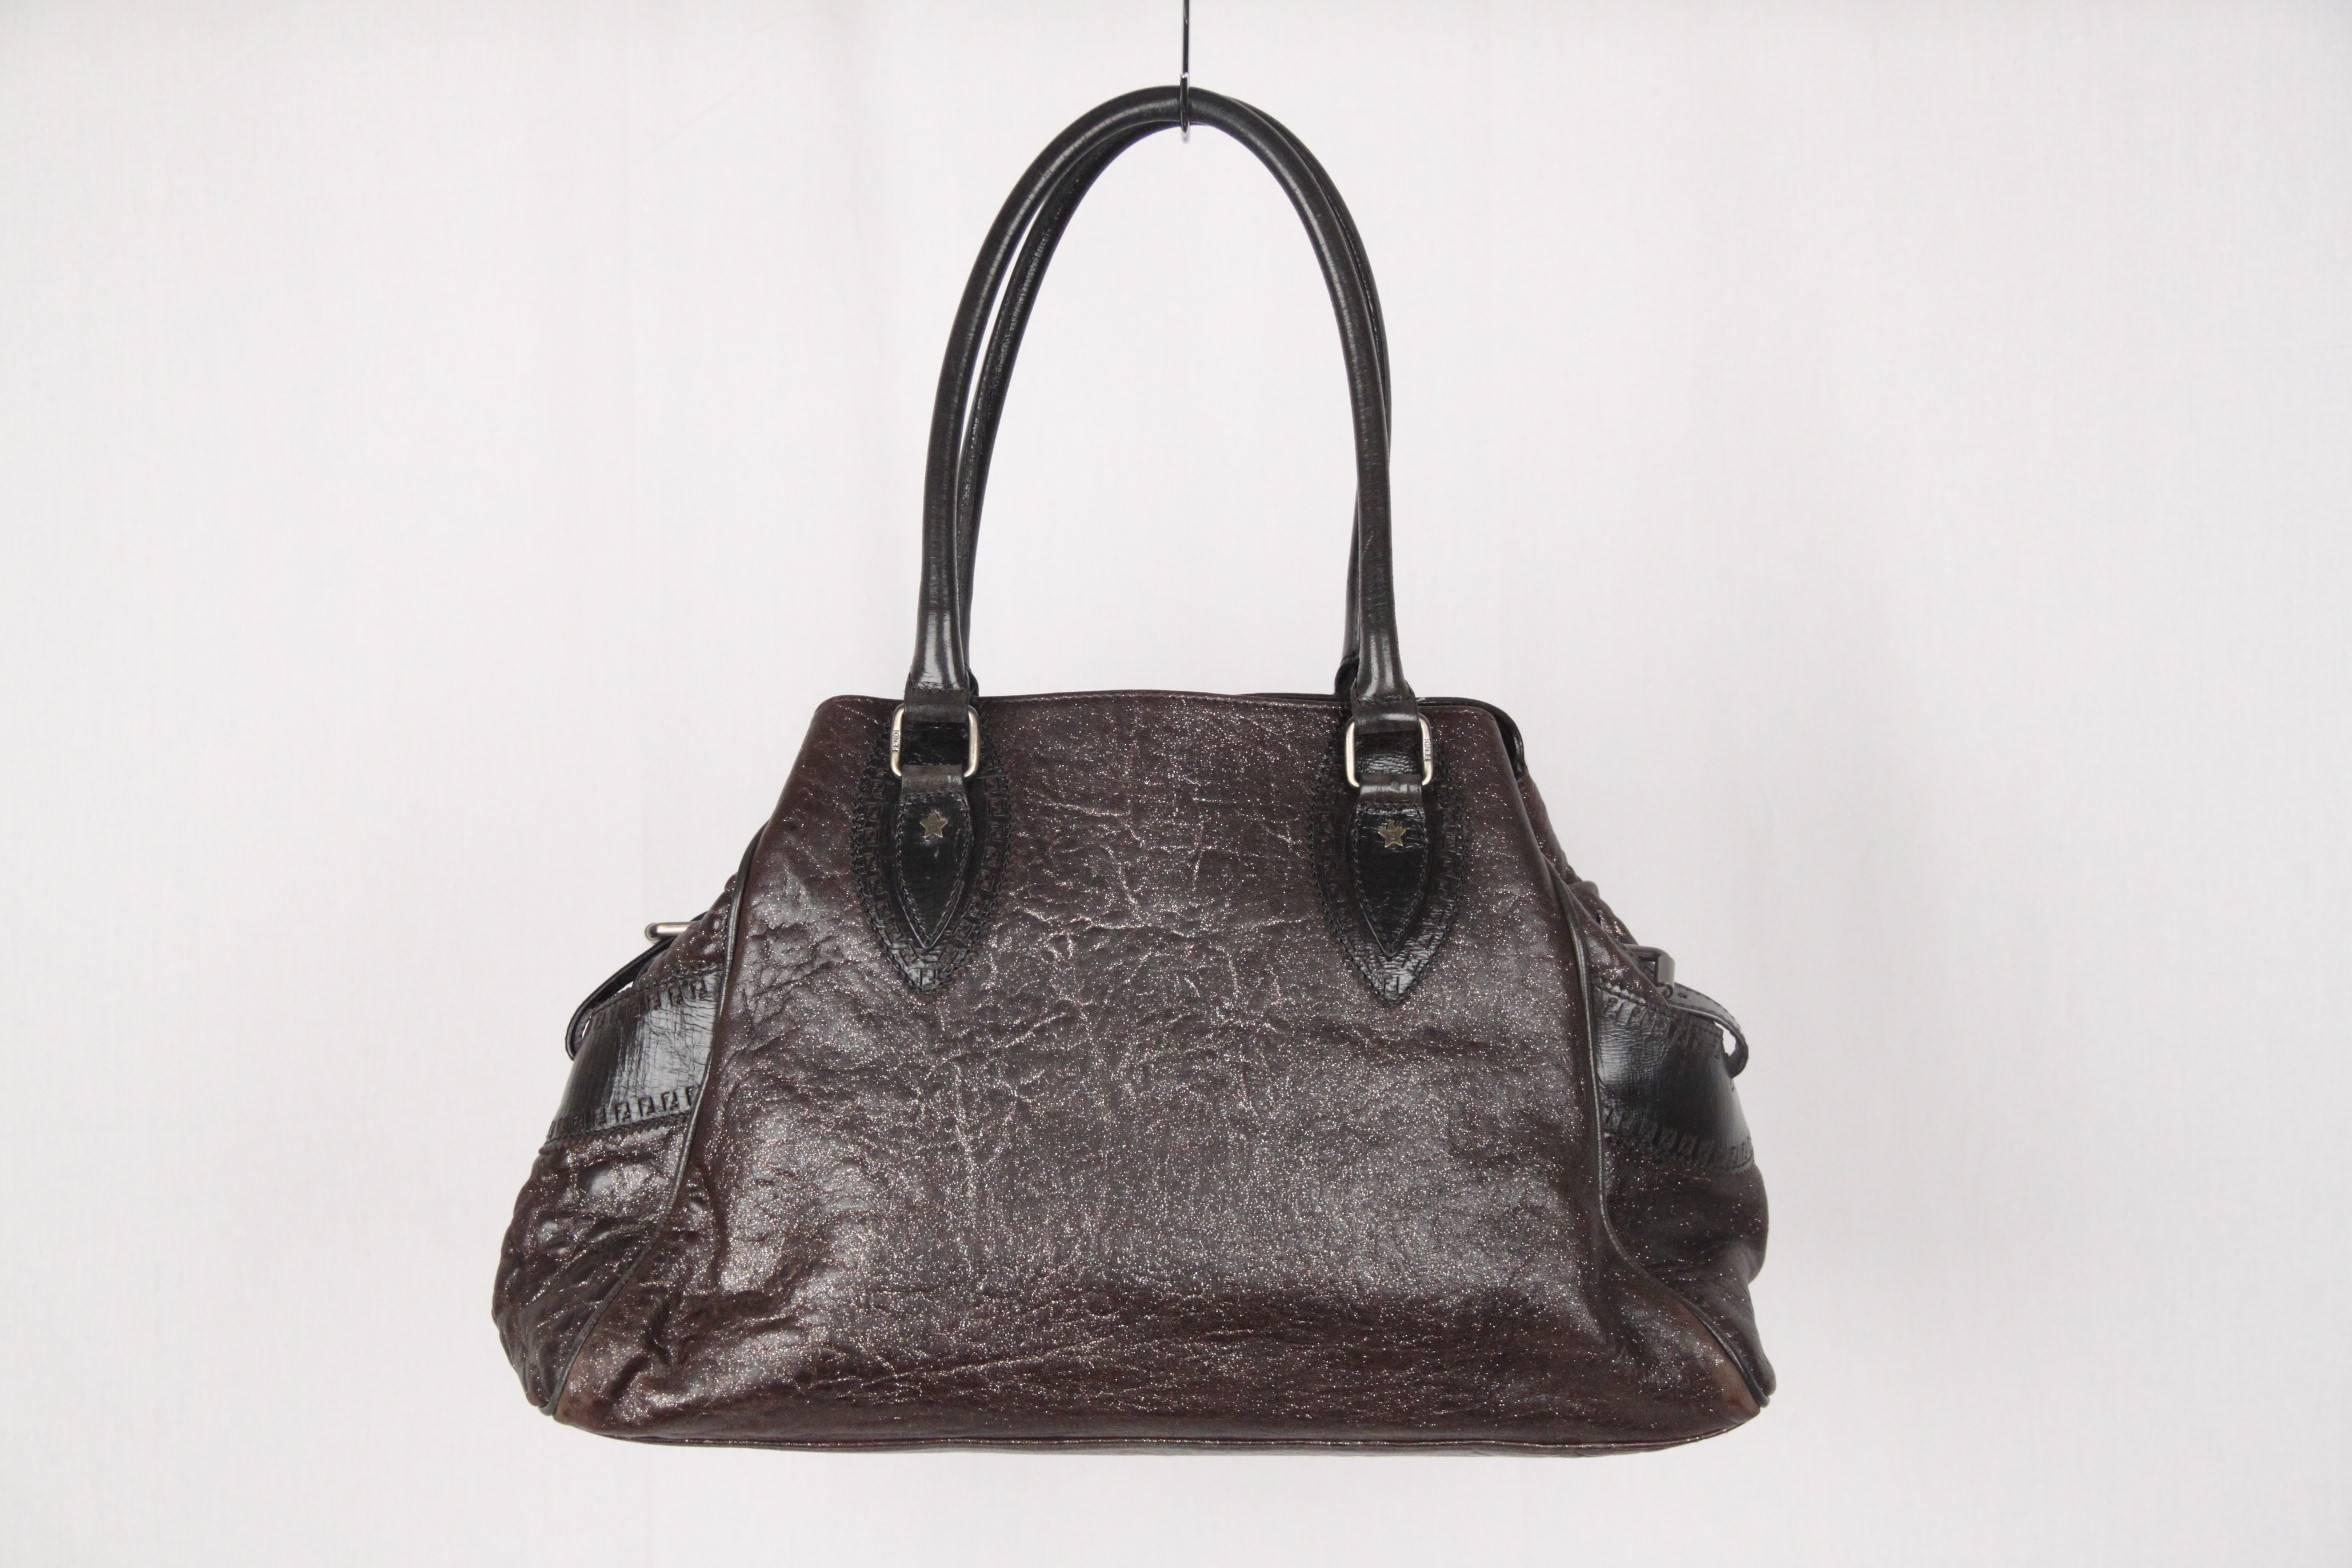 Authentic FENDI Brown Metallic Leather BAG DE JOUR BAG Tote SATCHEL For  Sale at 1stdibs